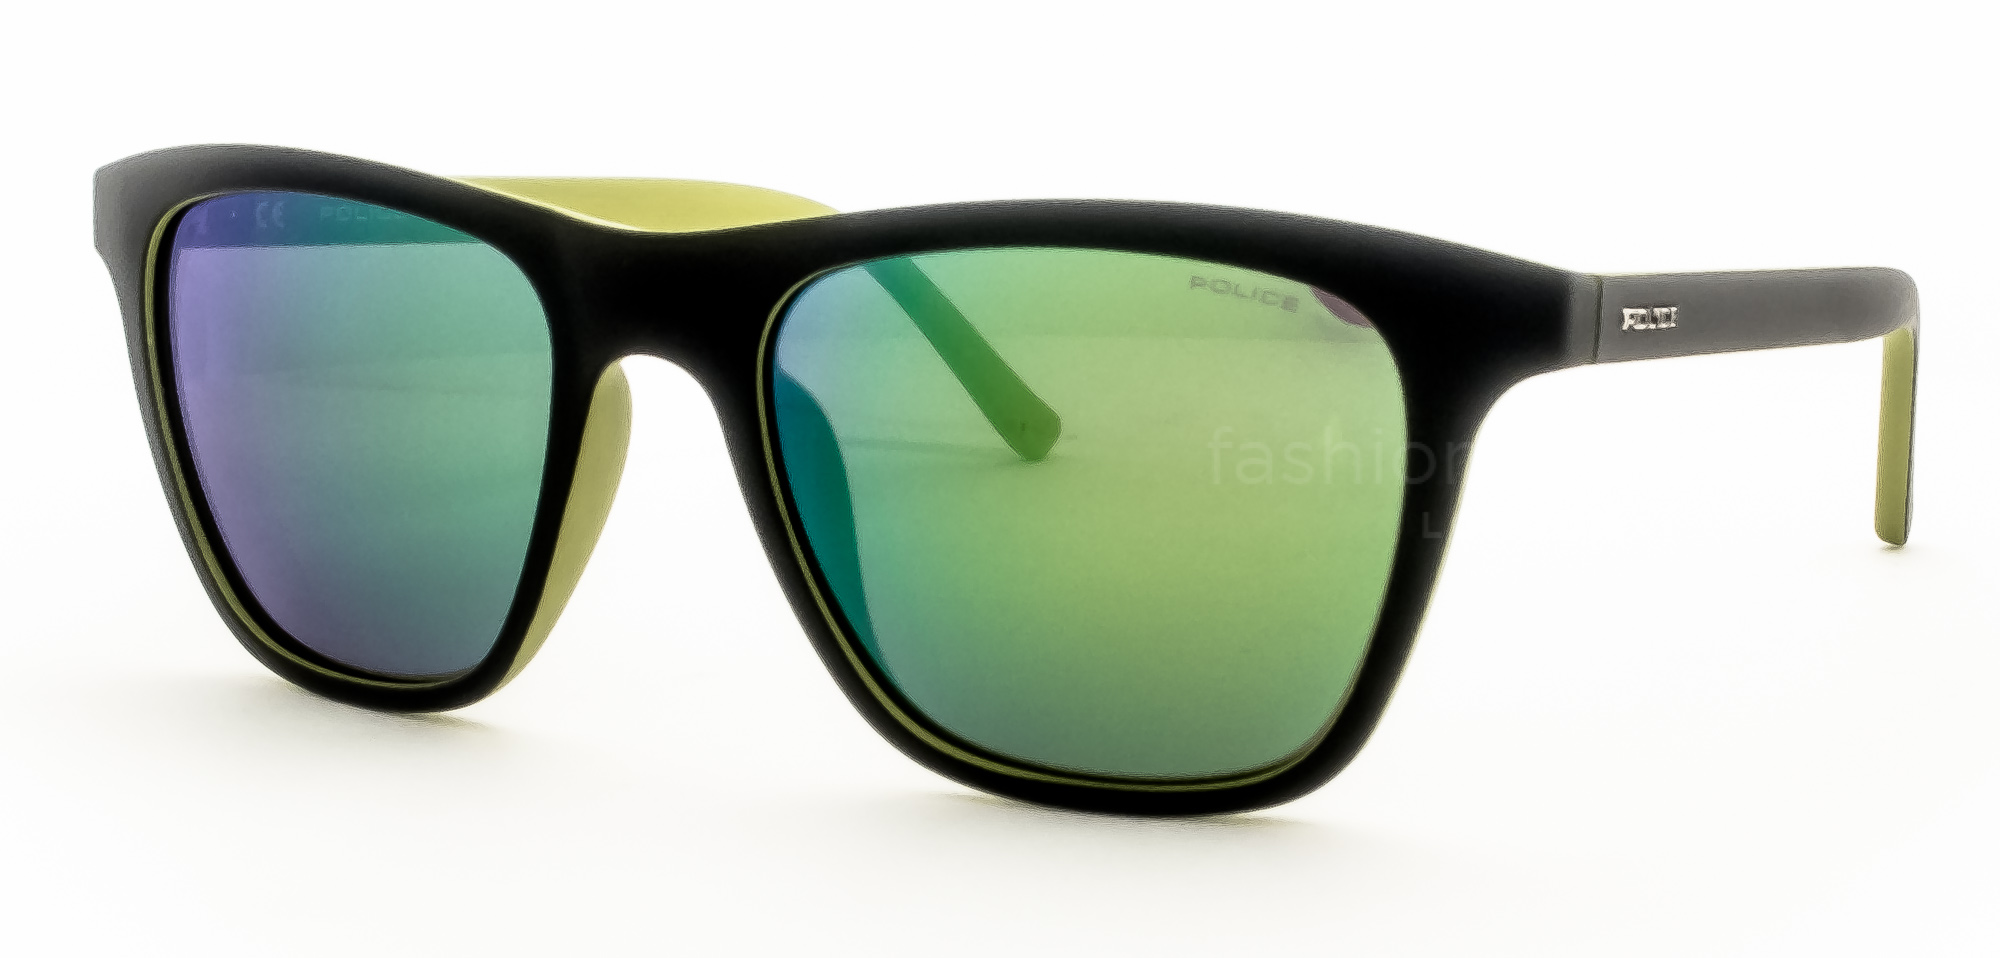 Police sunglasses discount designer sunglasses for Decor my eyes